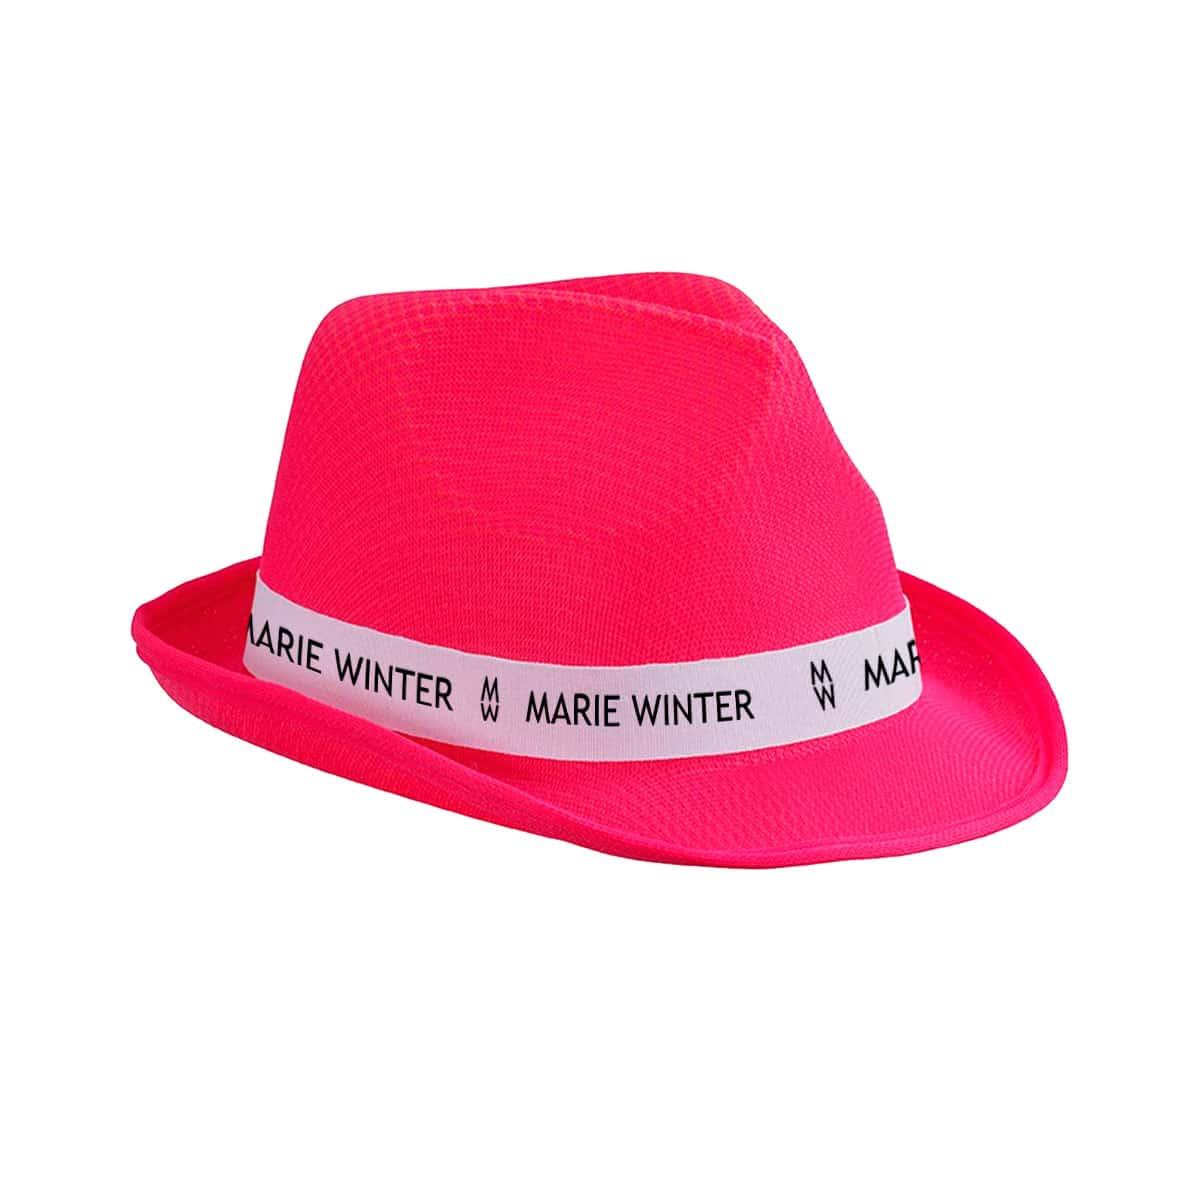 Marie Winter Hut pink